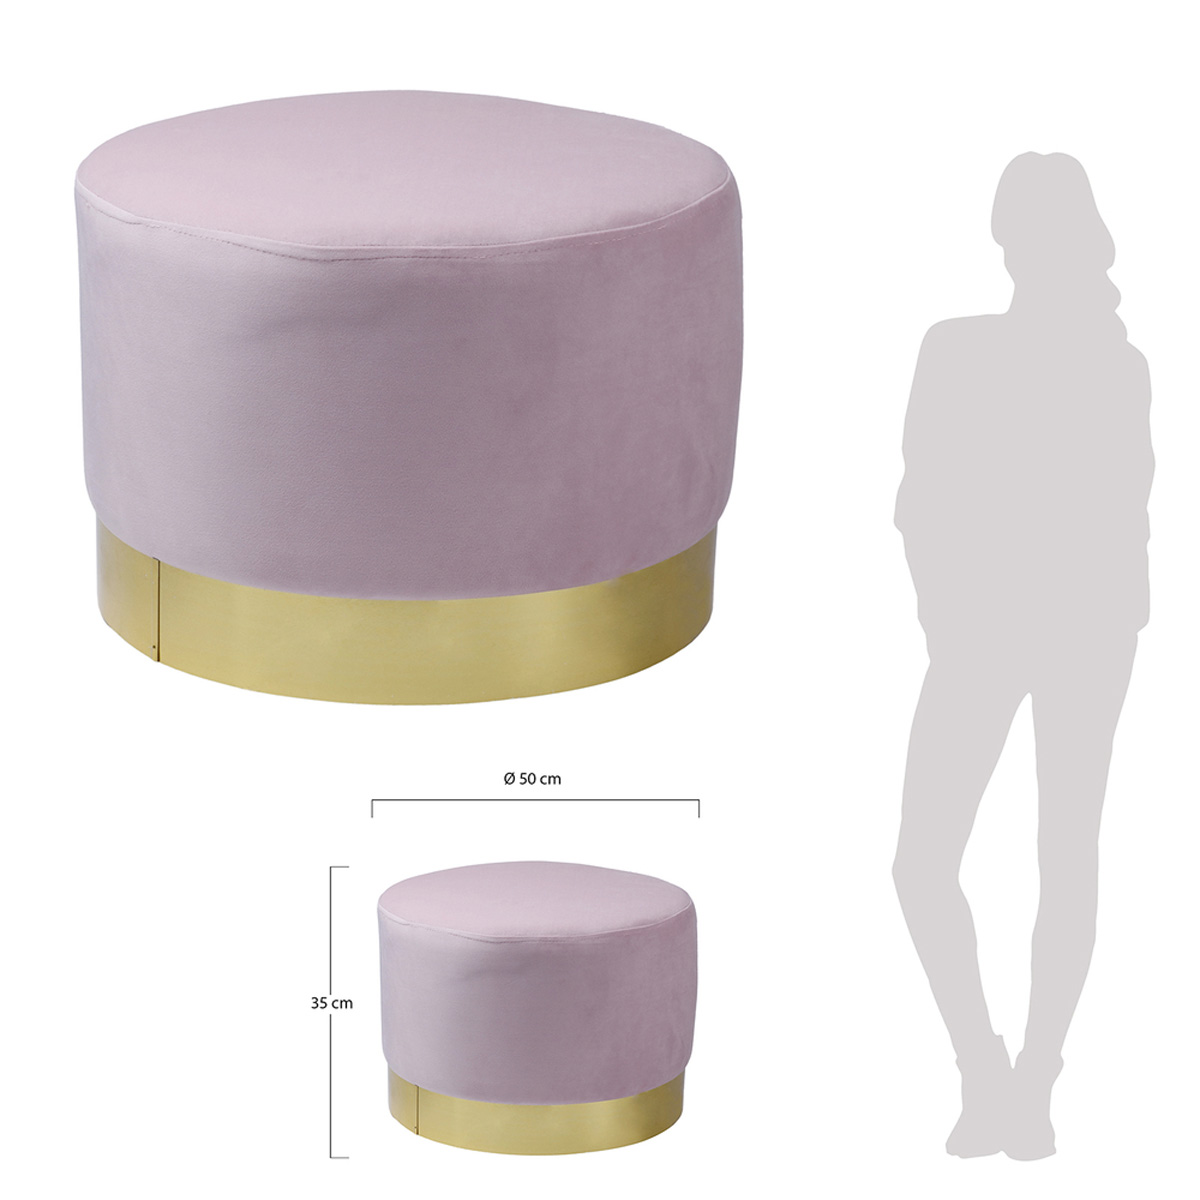 Pouf design velours \'Scarlett\' rose doré - 50x35 cm - [R0287]